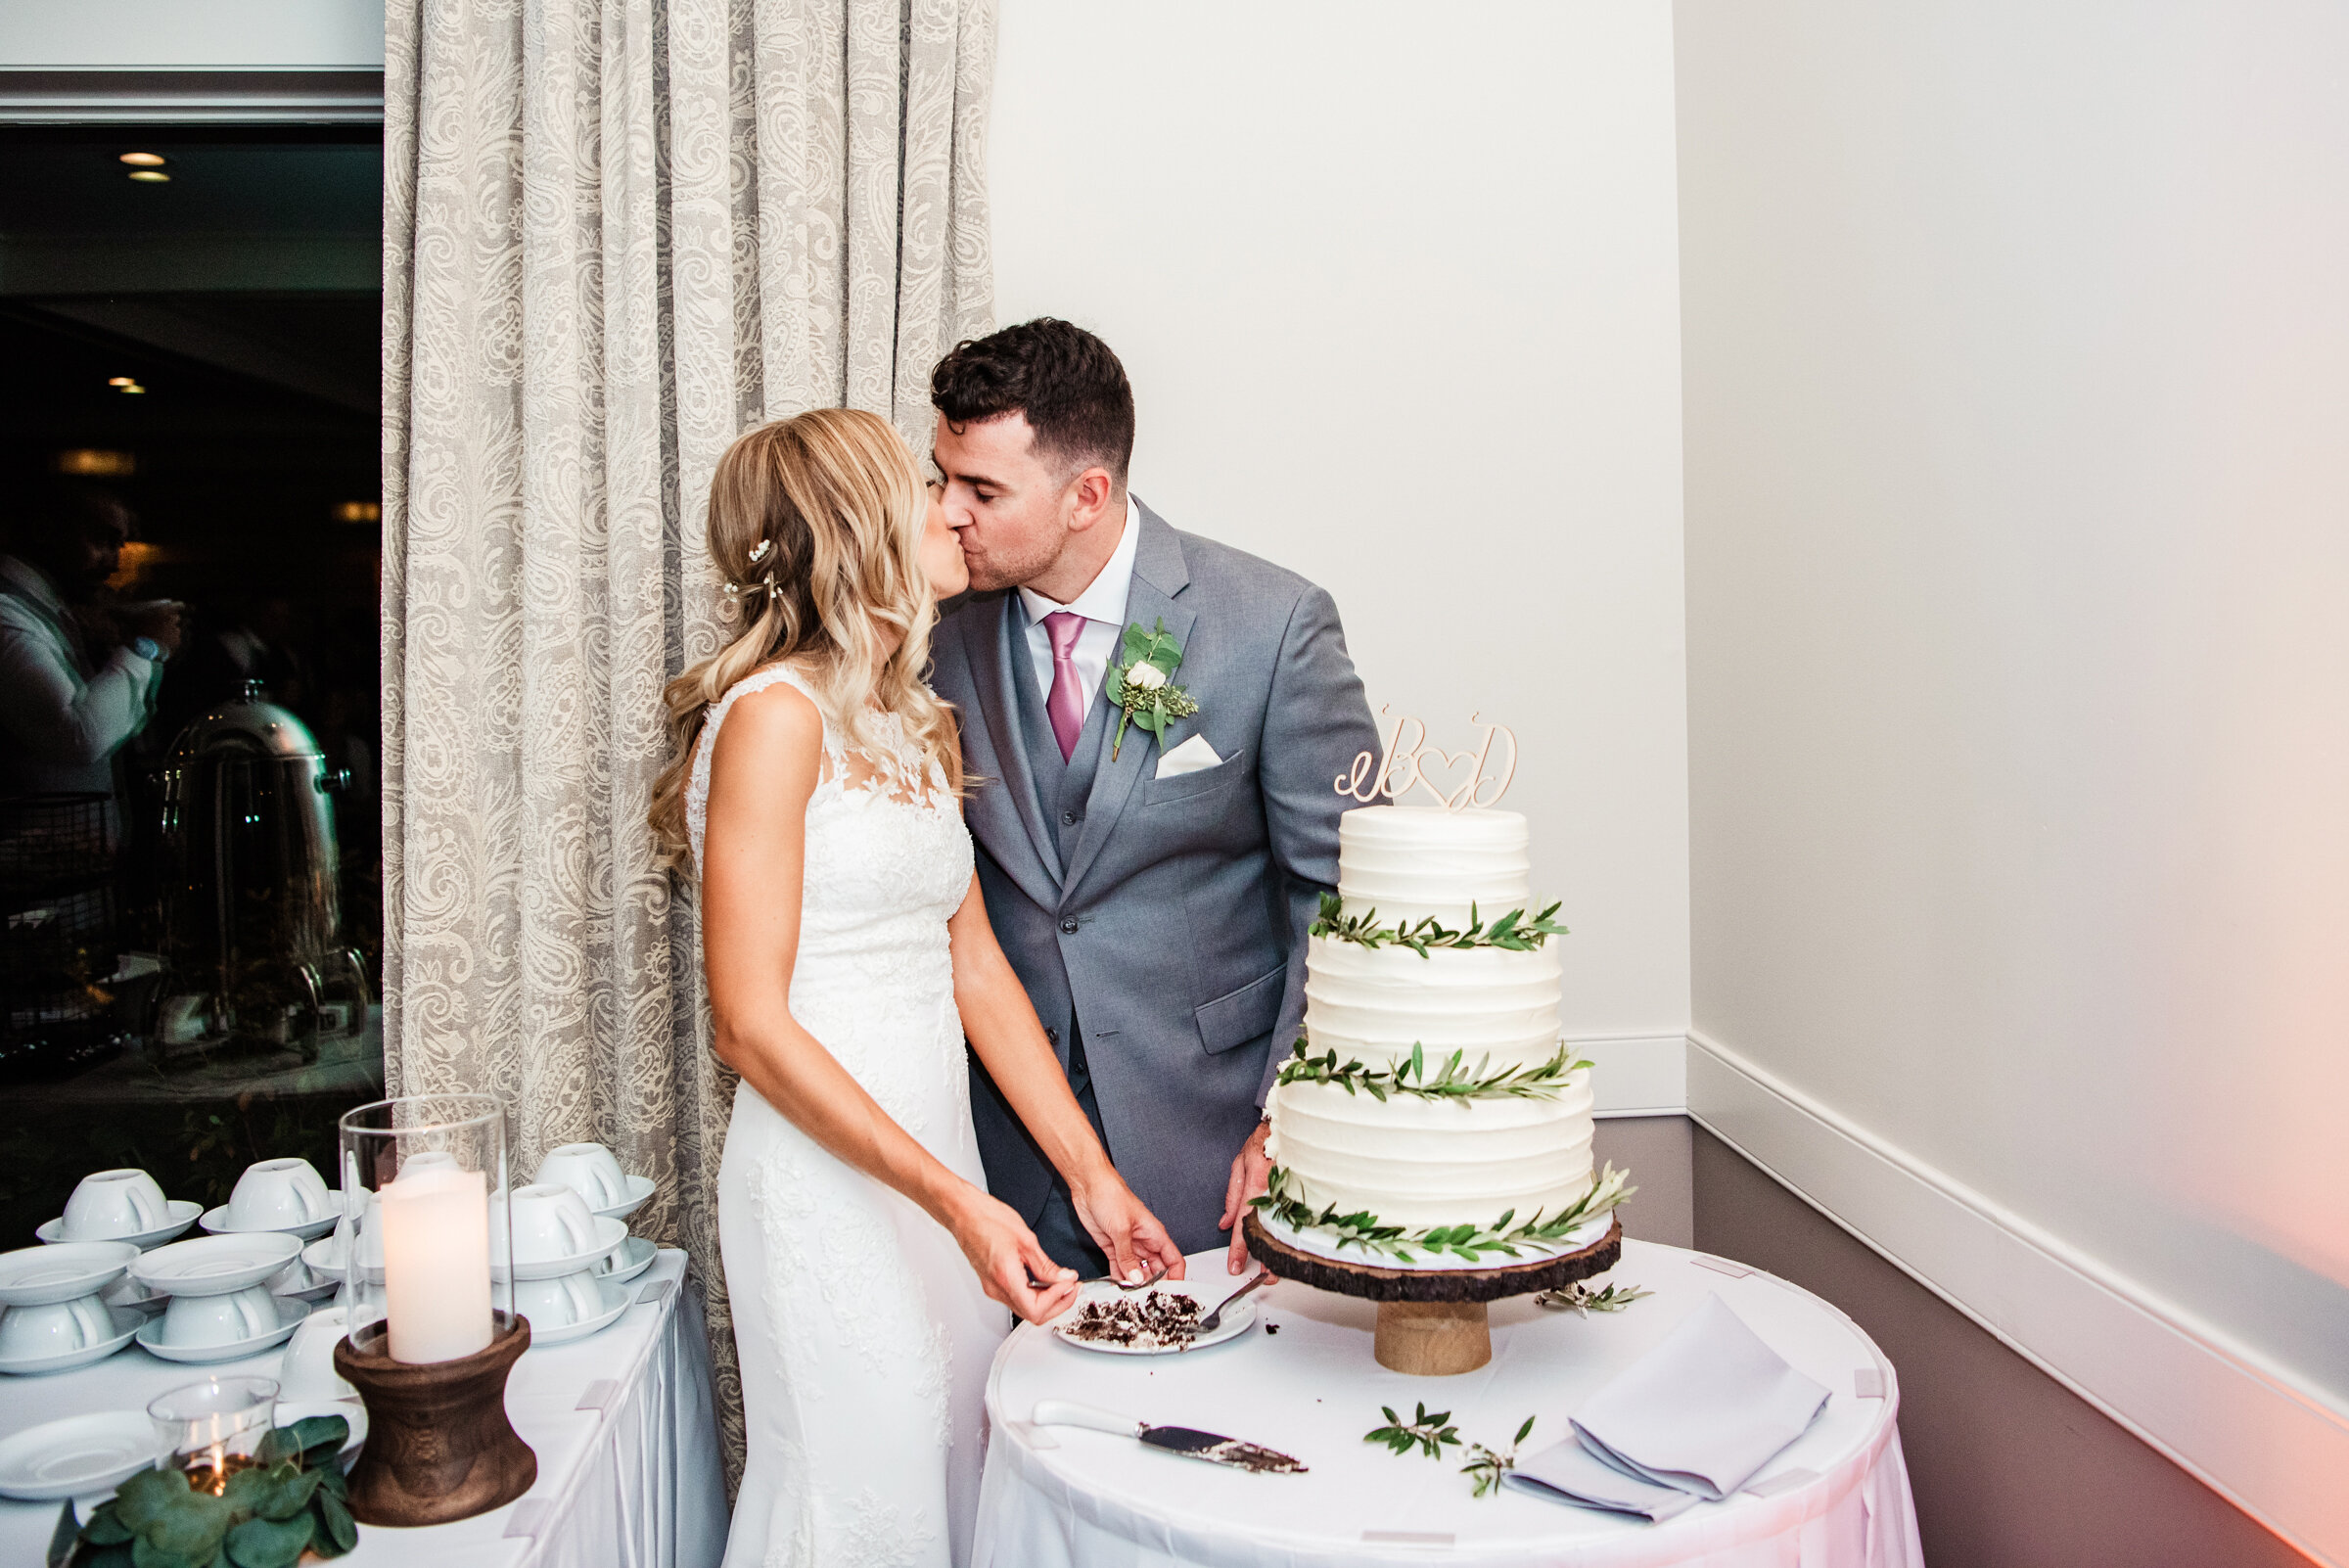 Deerfield_Country_Club_Rochester_Wedding_JILL_STUDIO_Rochester_NY_Photographer_DSC_7277.jpg